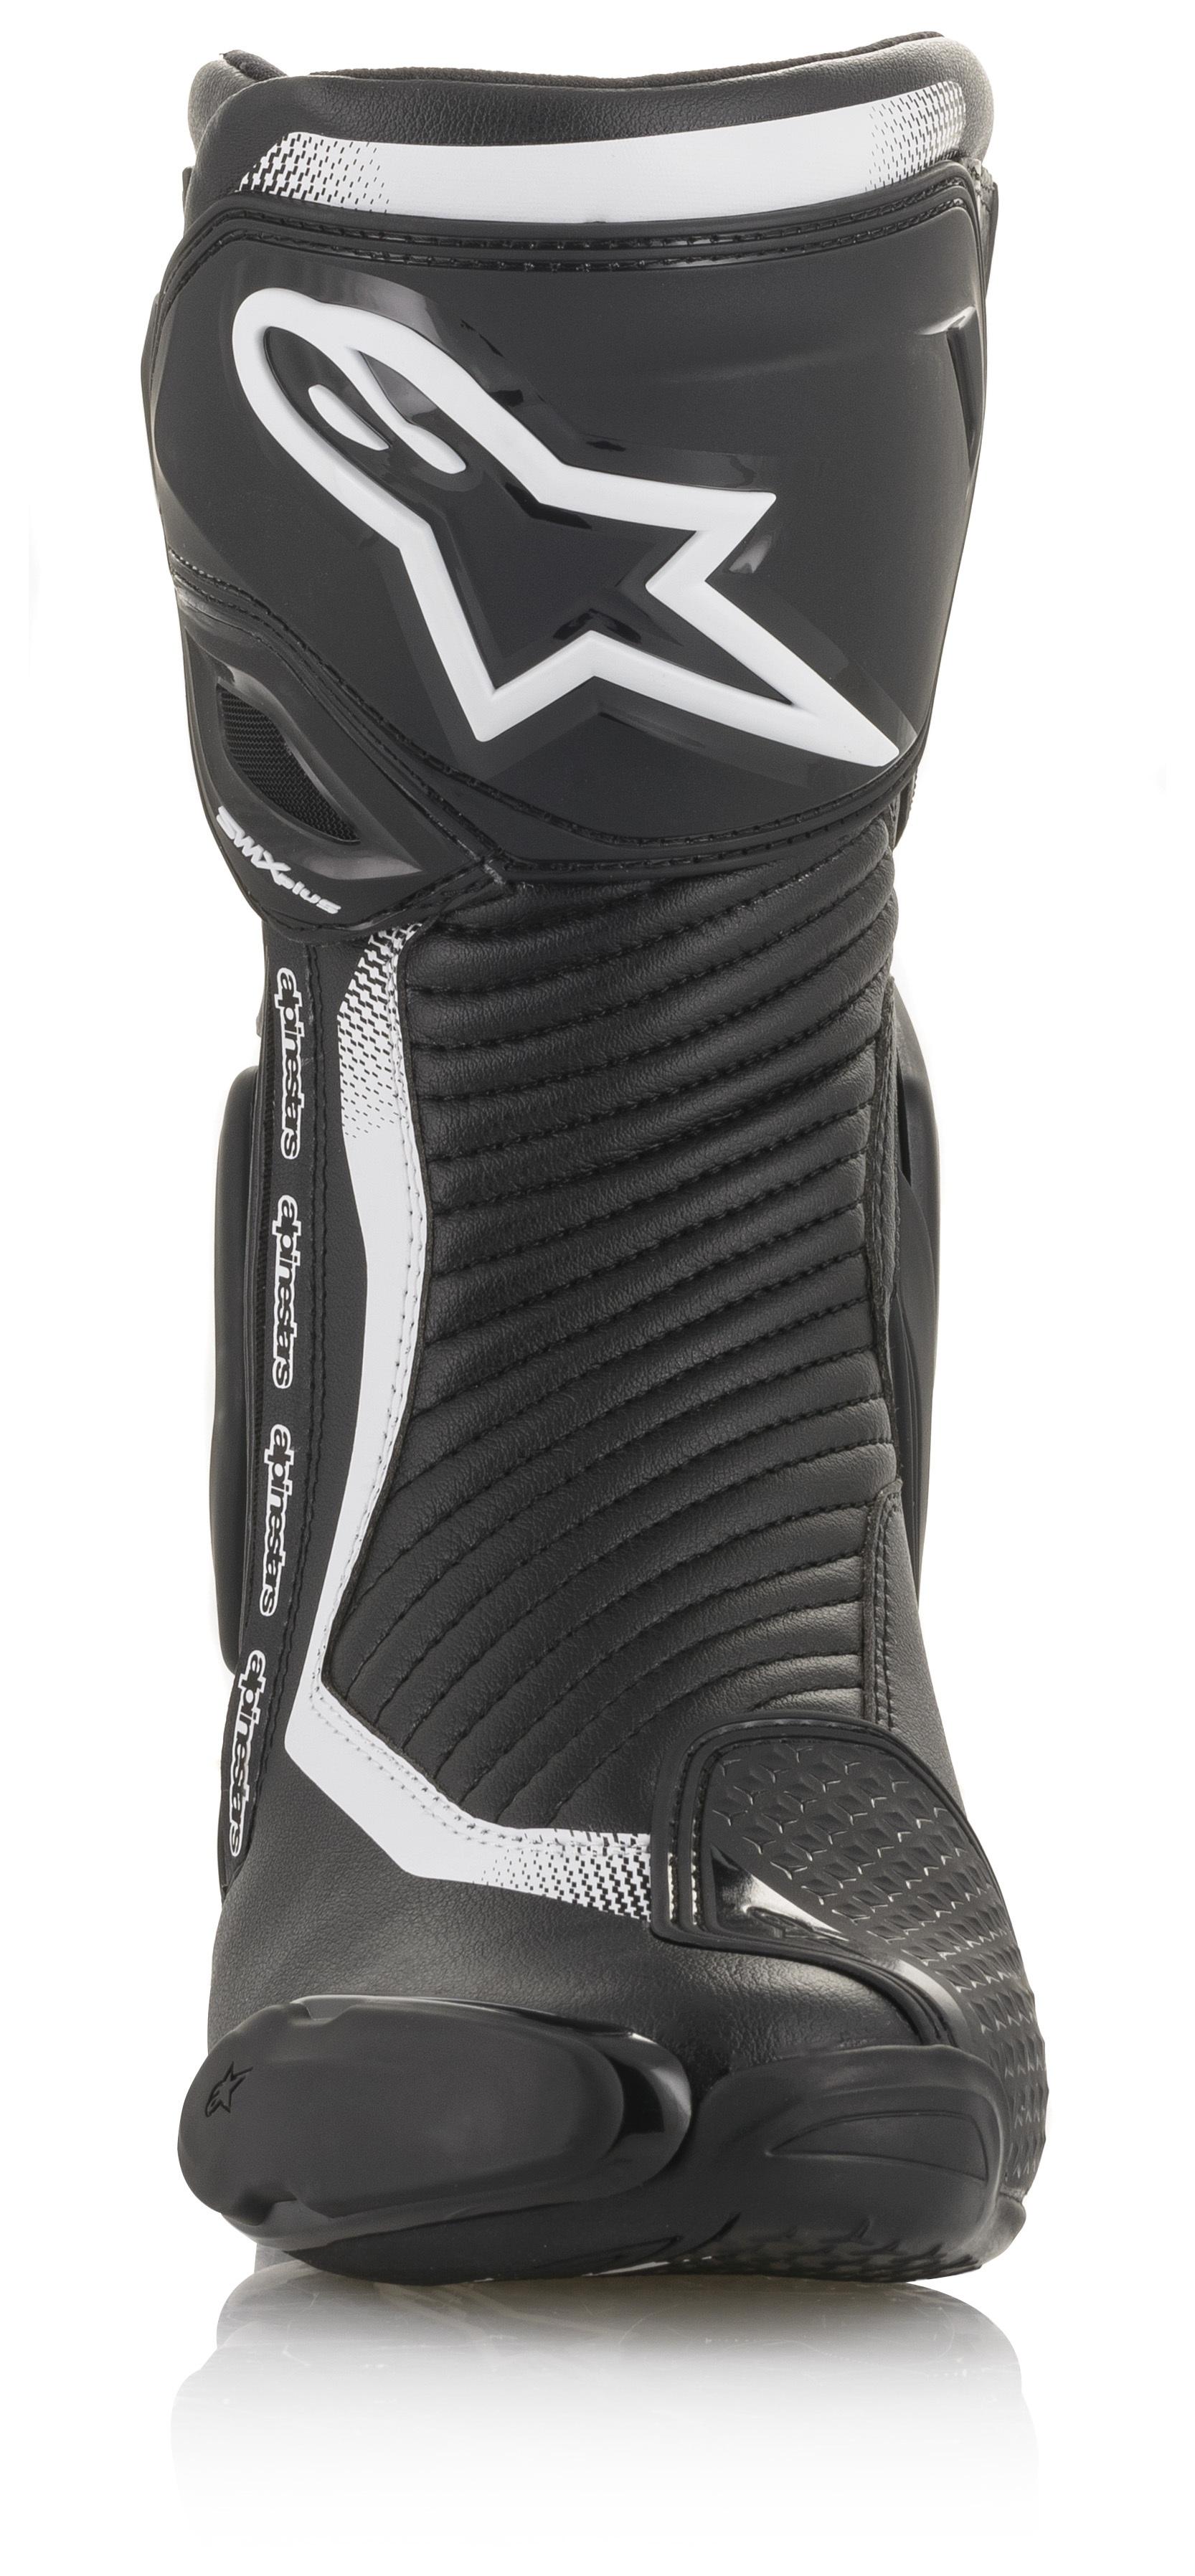 Alpinestars Stella SMX Plus v2 Boots